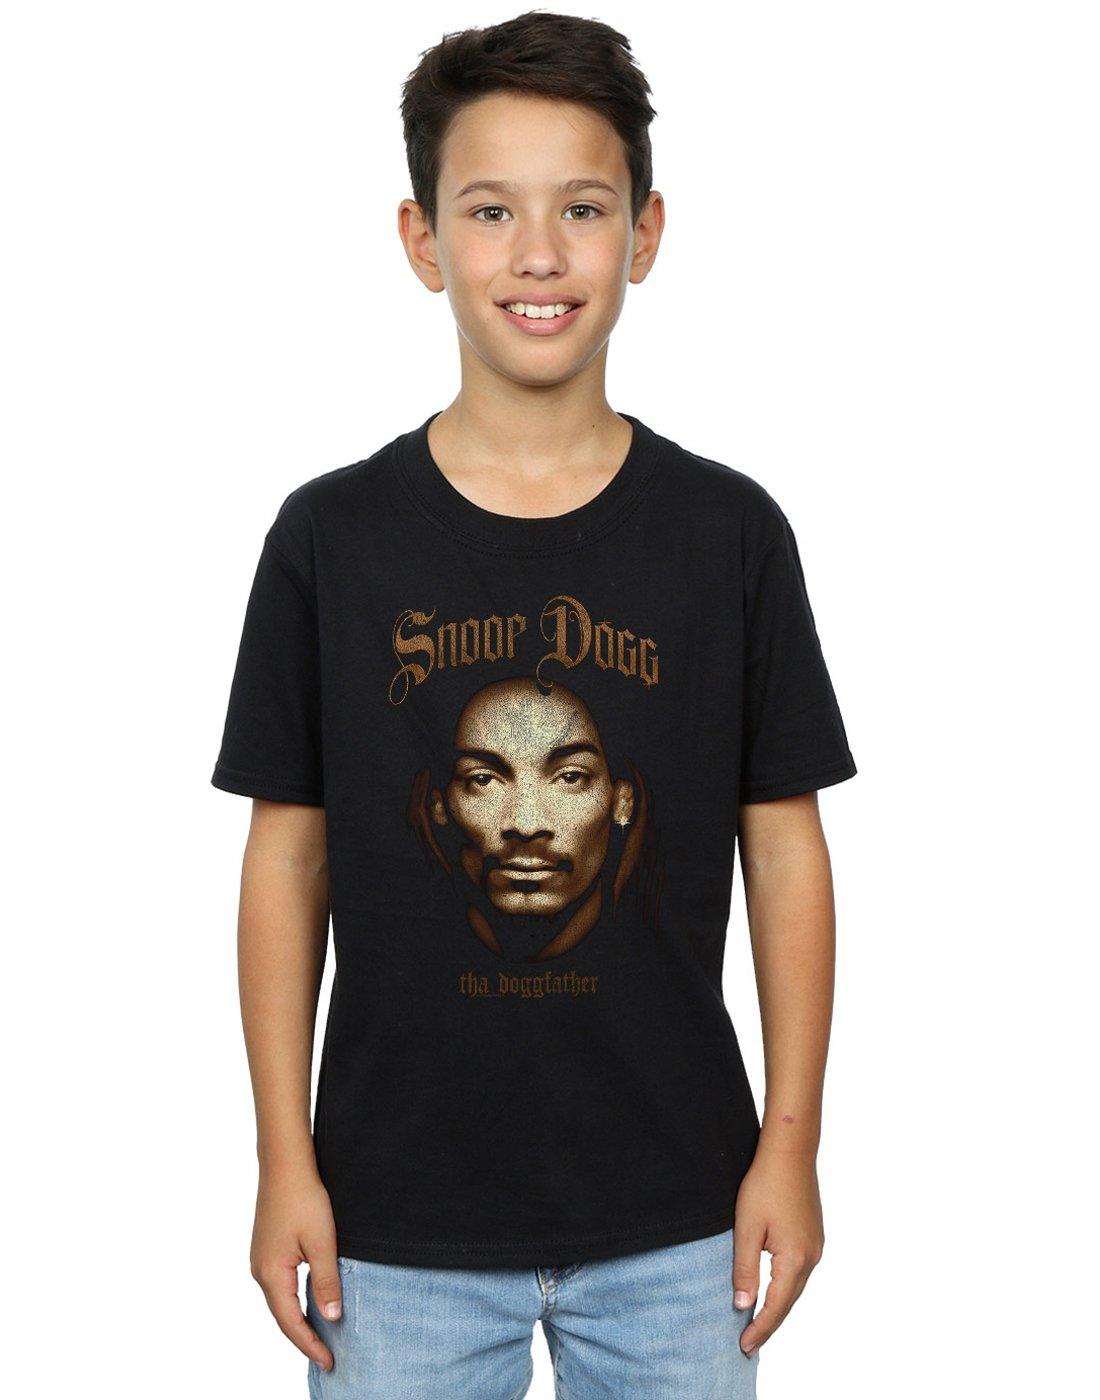 Snoop Dogg Tha Doggfather Tshirt